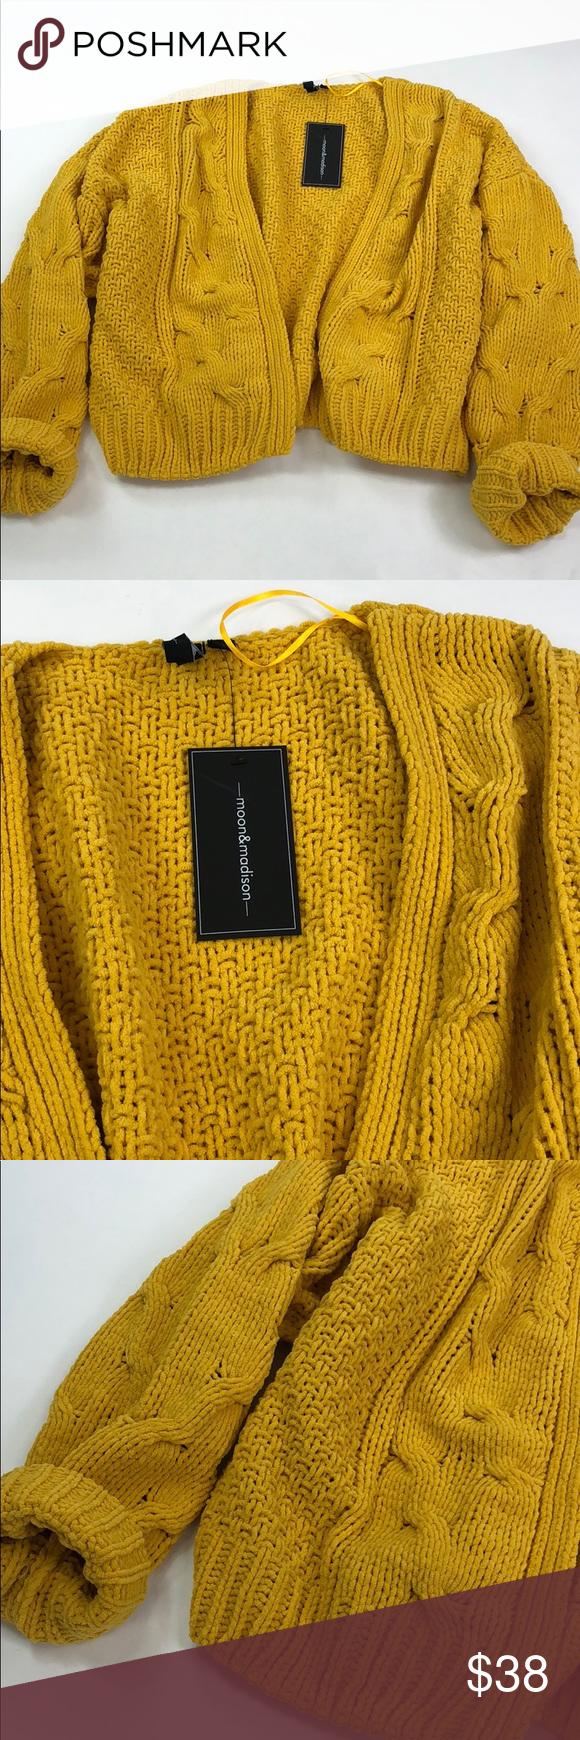 Moon Madison Mustard Yellow Cable Knit Cardigan Nwt My Posh